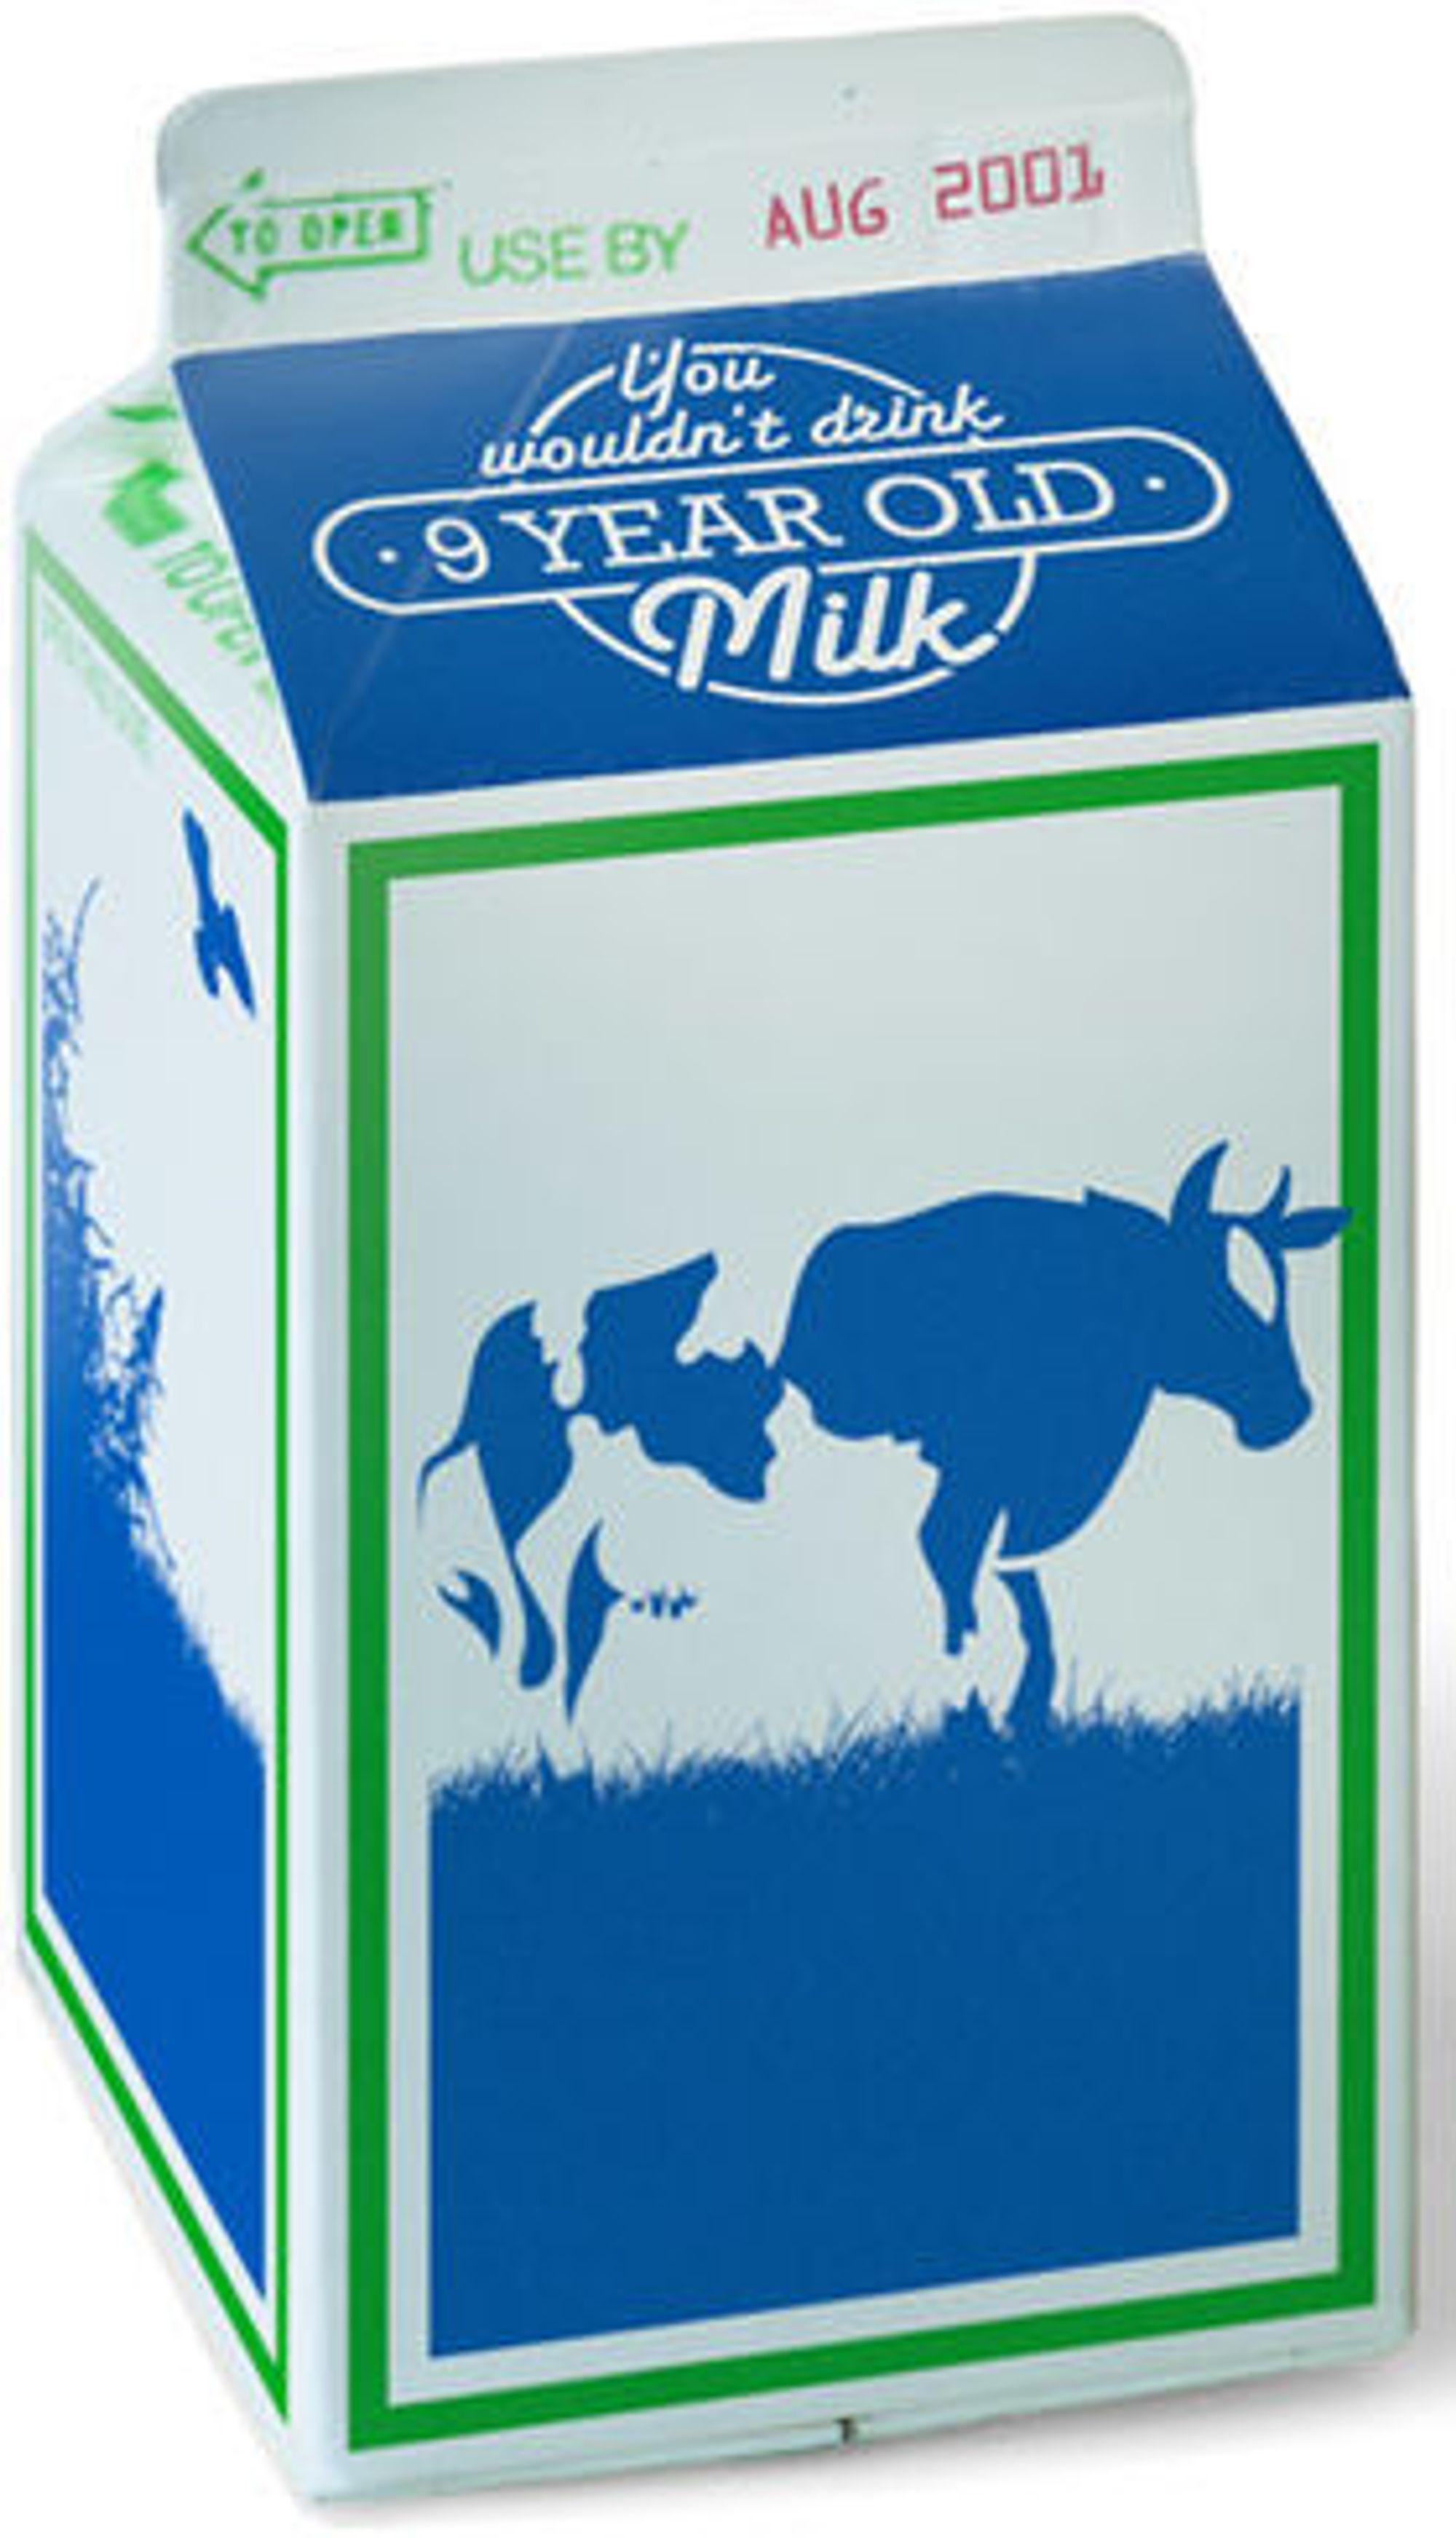 Microsoft sammenligner IE6 med (den gang) ni år gammel melk.